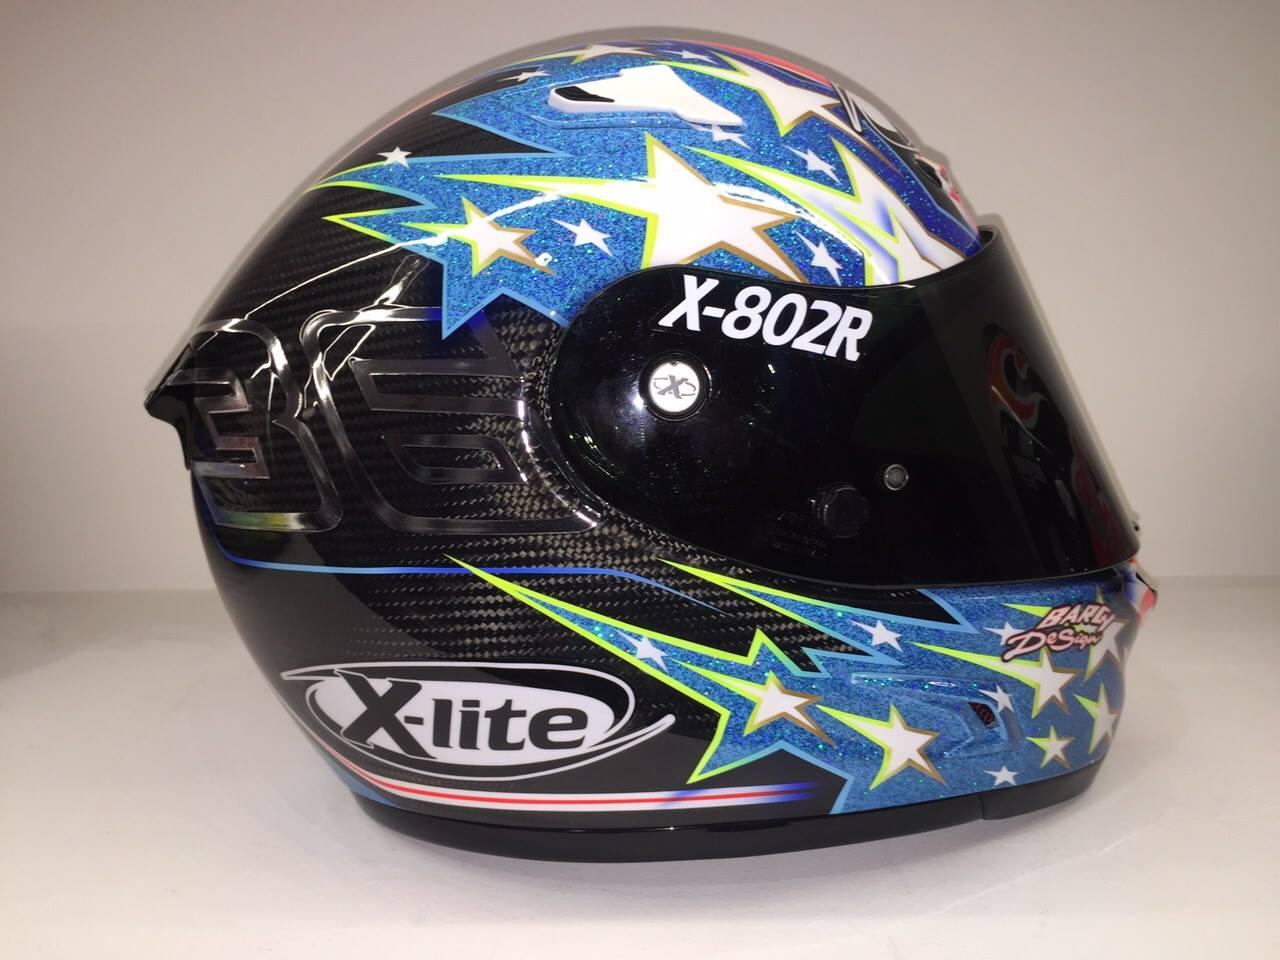 racing helmets garage x lite x 802r ultra carbon t. Black Bedroom Furniture Sets. Home Design Ideas